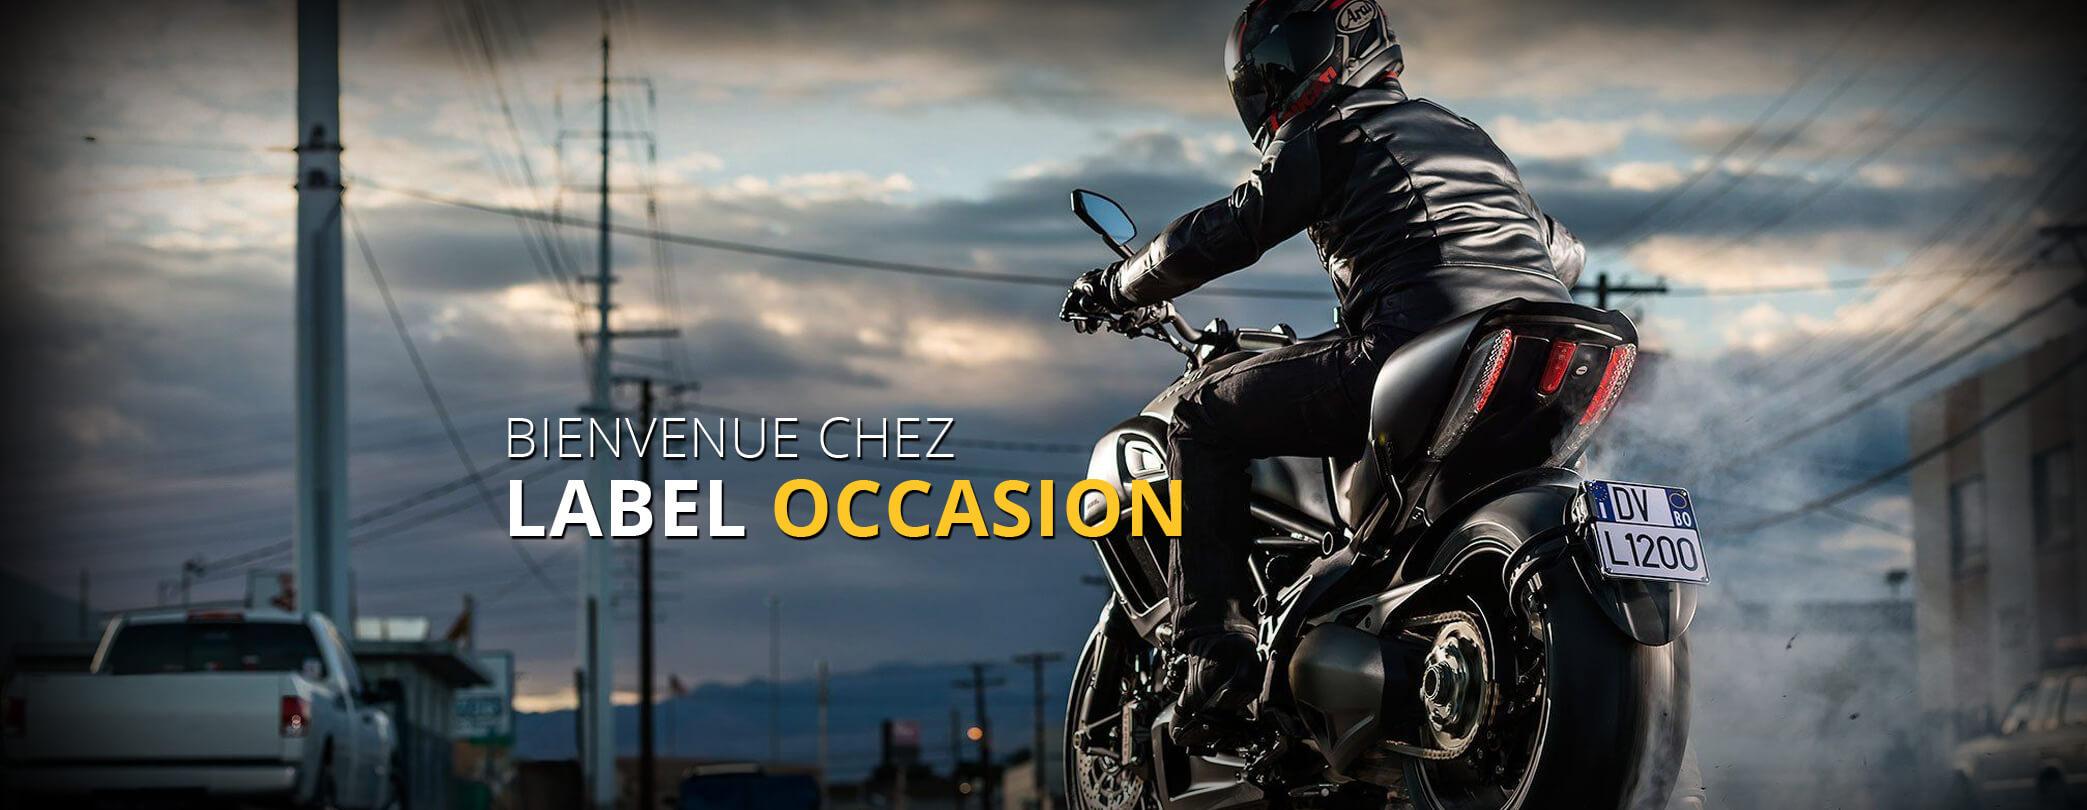 Label Occasion Moto Doccasion Lyon Moto Occasion Rhône 69